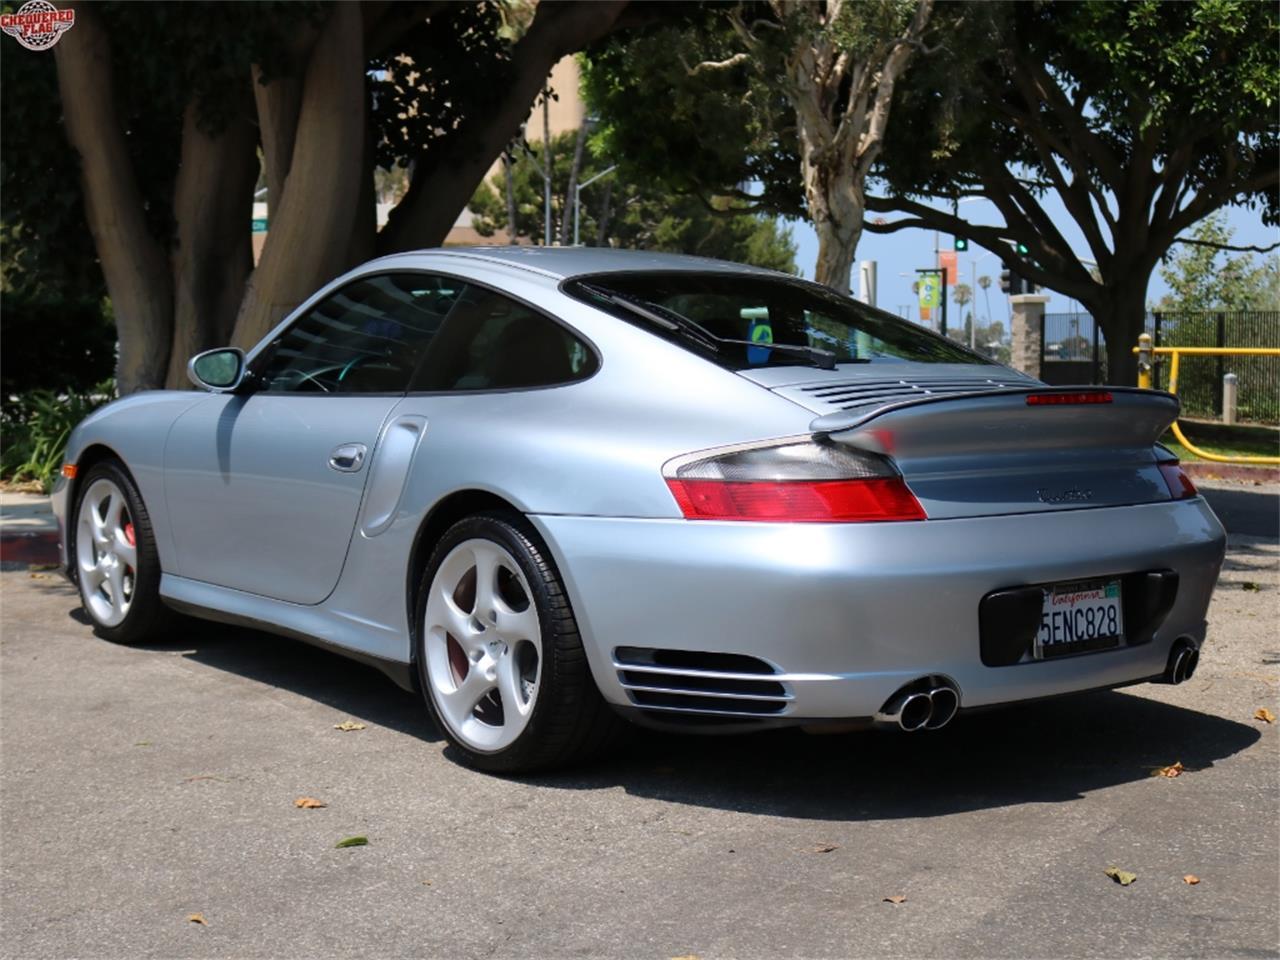 Large Picture of '04 Porsche 911 located in Marina Del Rey California - LGNP